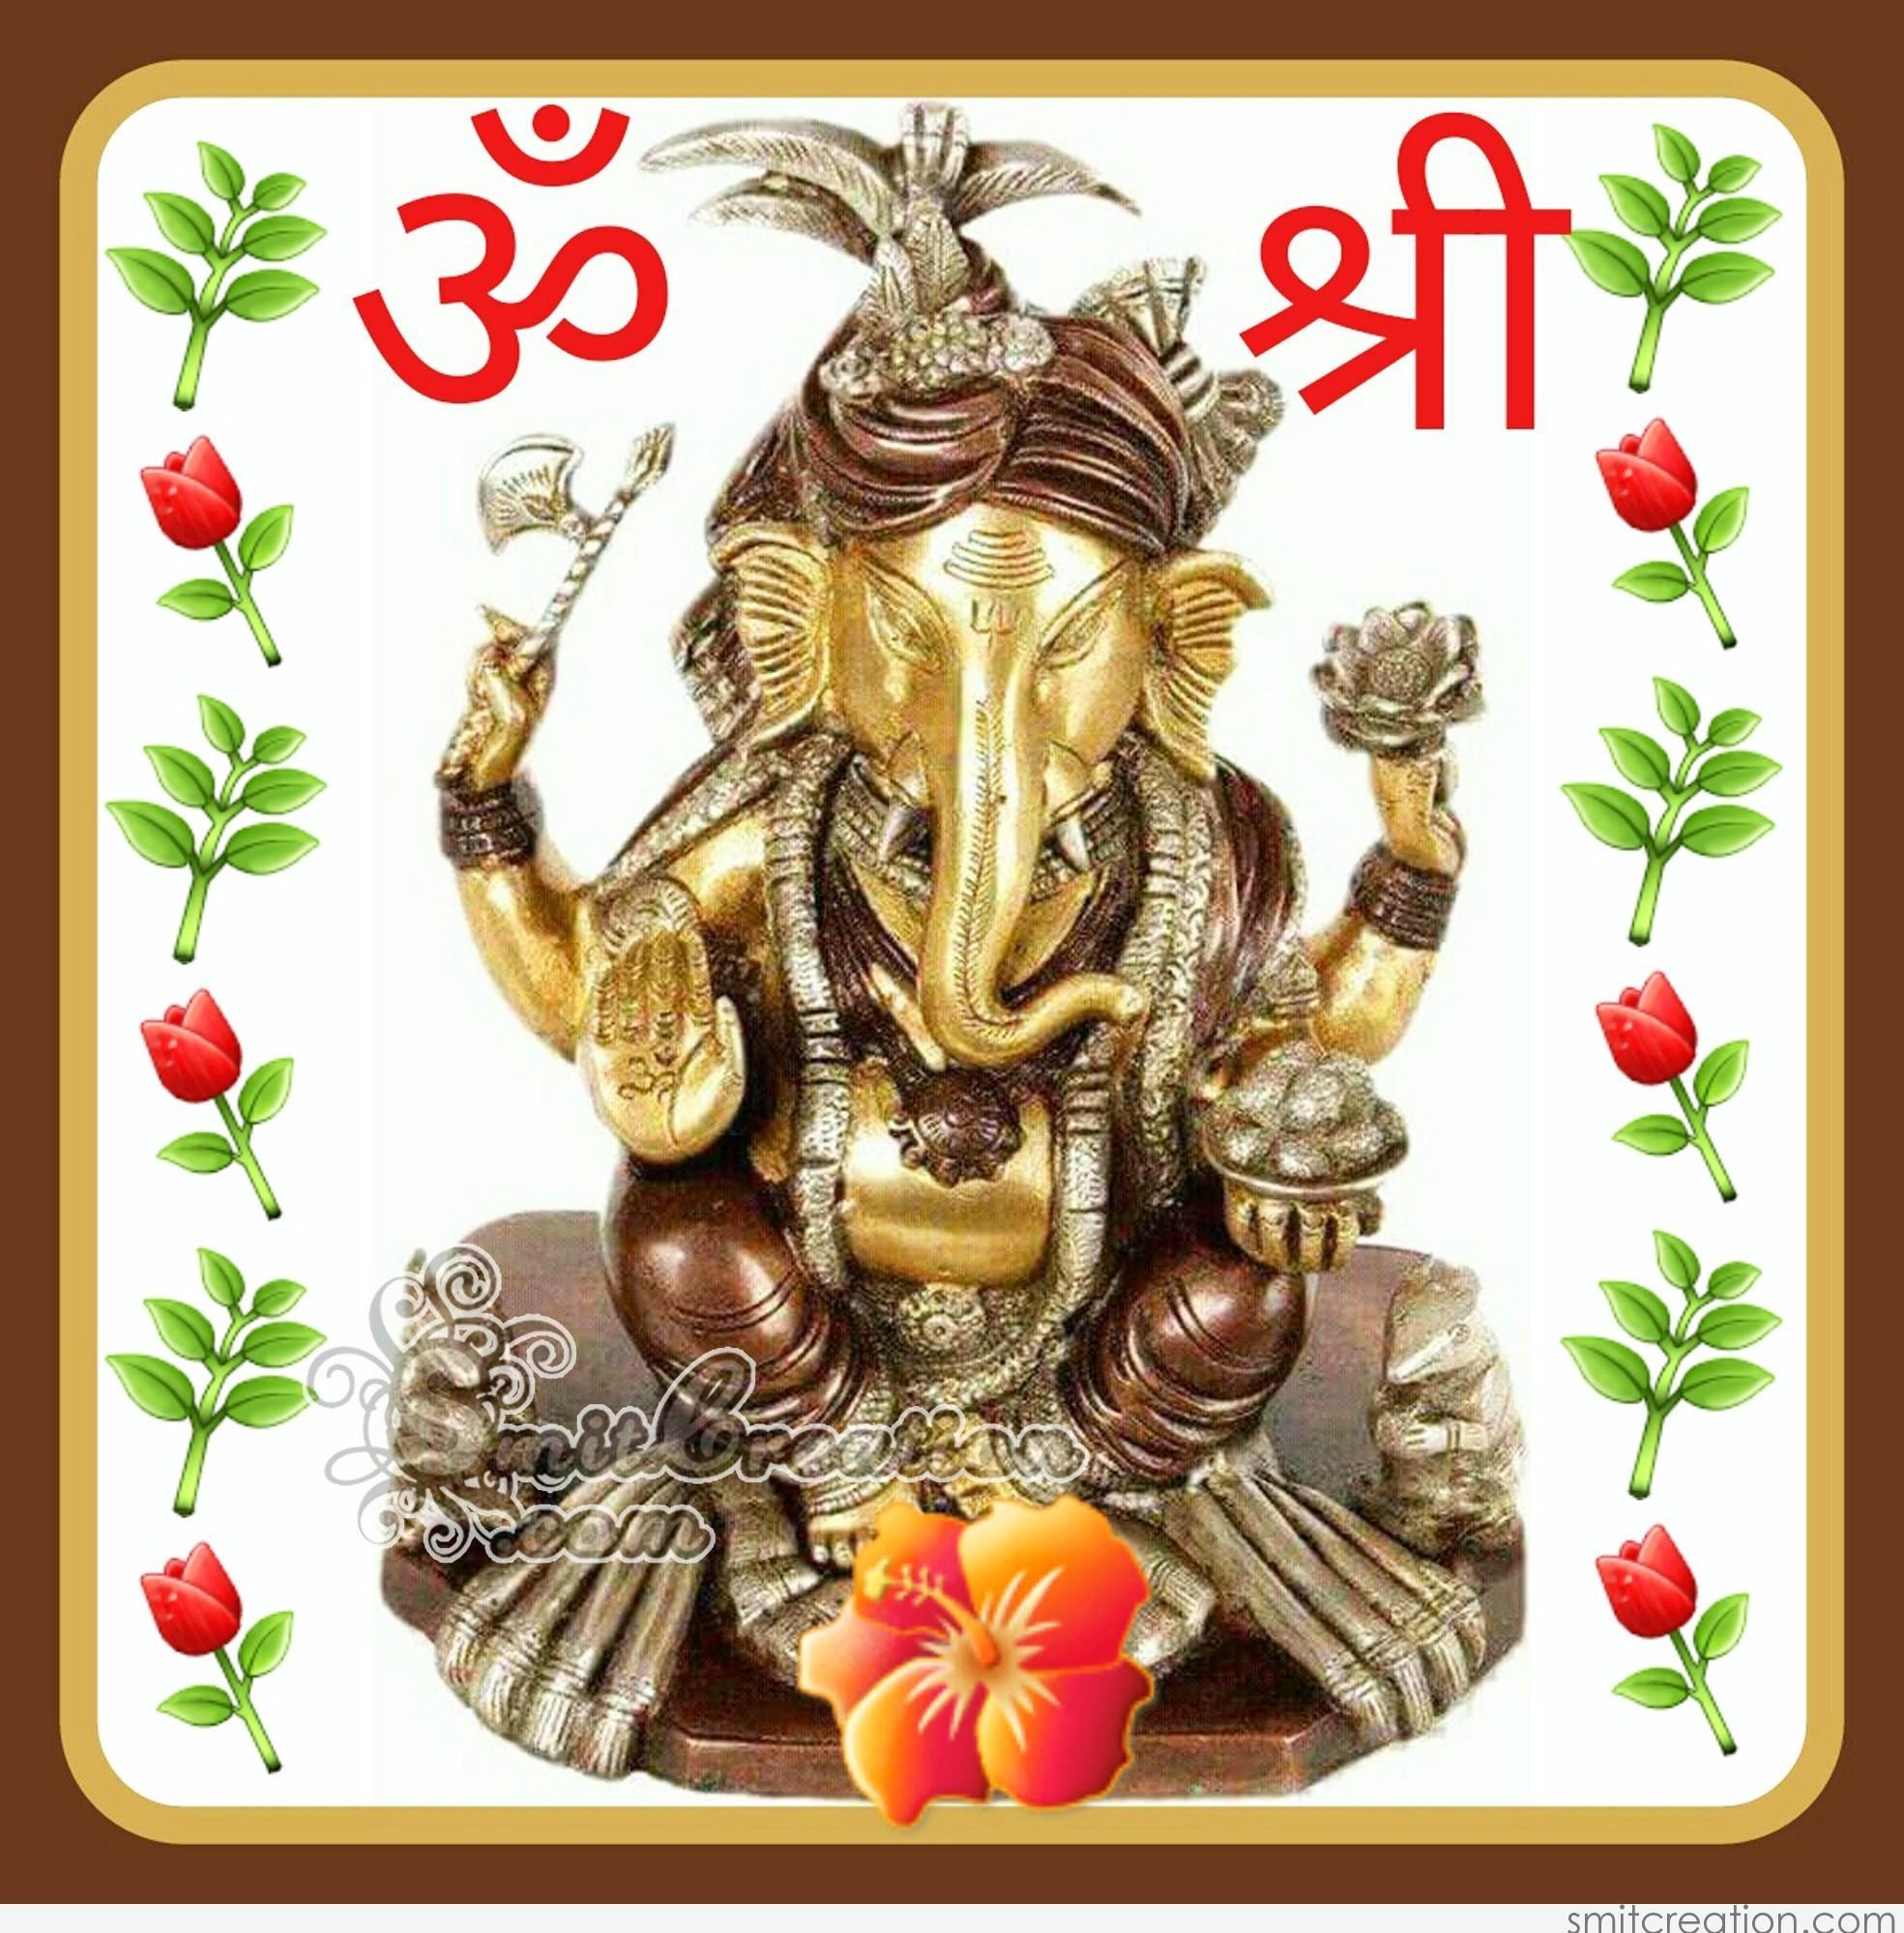 Om Shri Ganeshay Namah